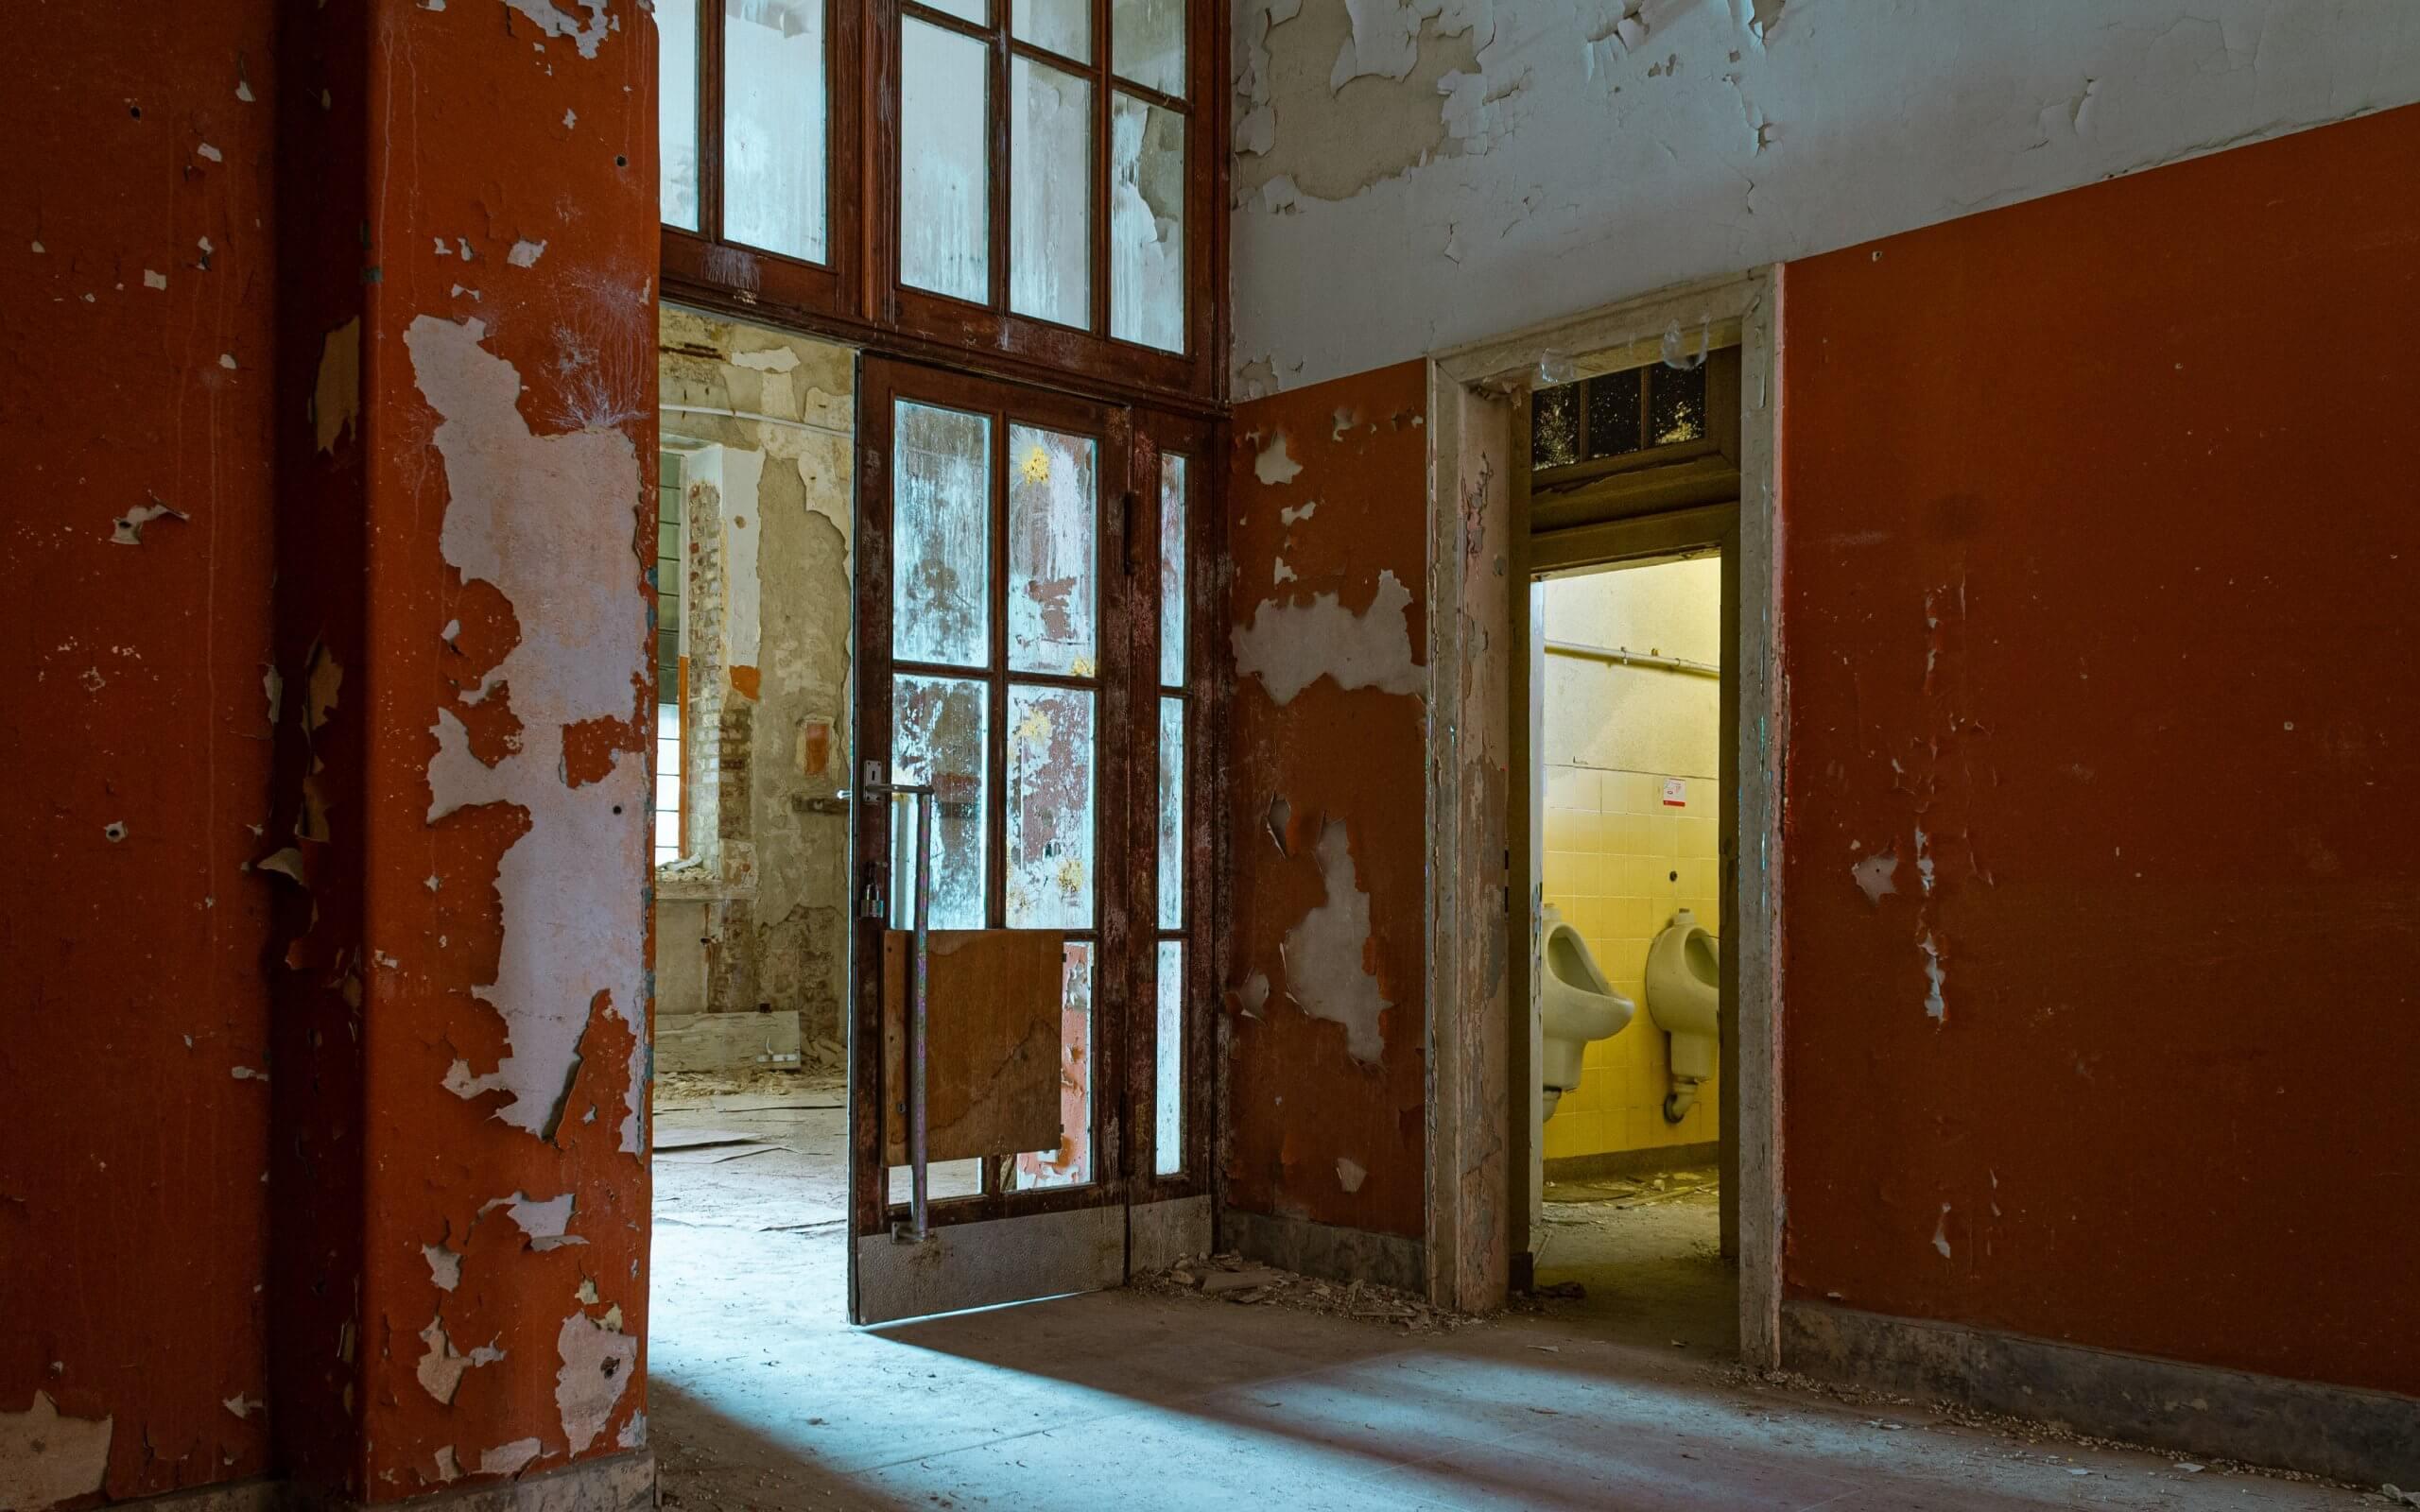 Lost Places Fotografie - Türen